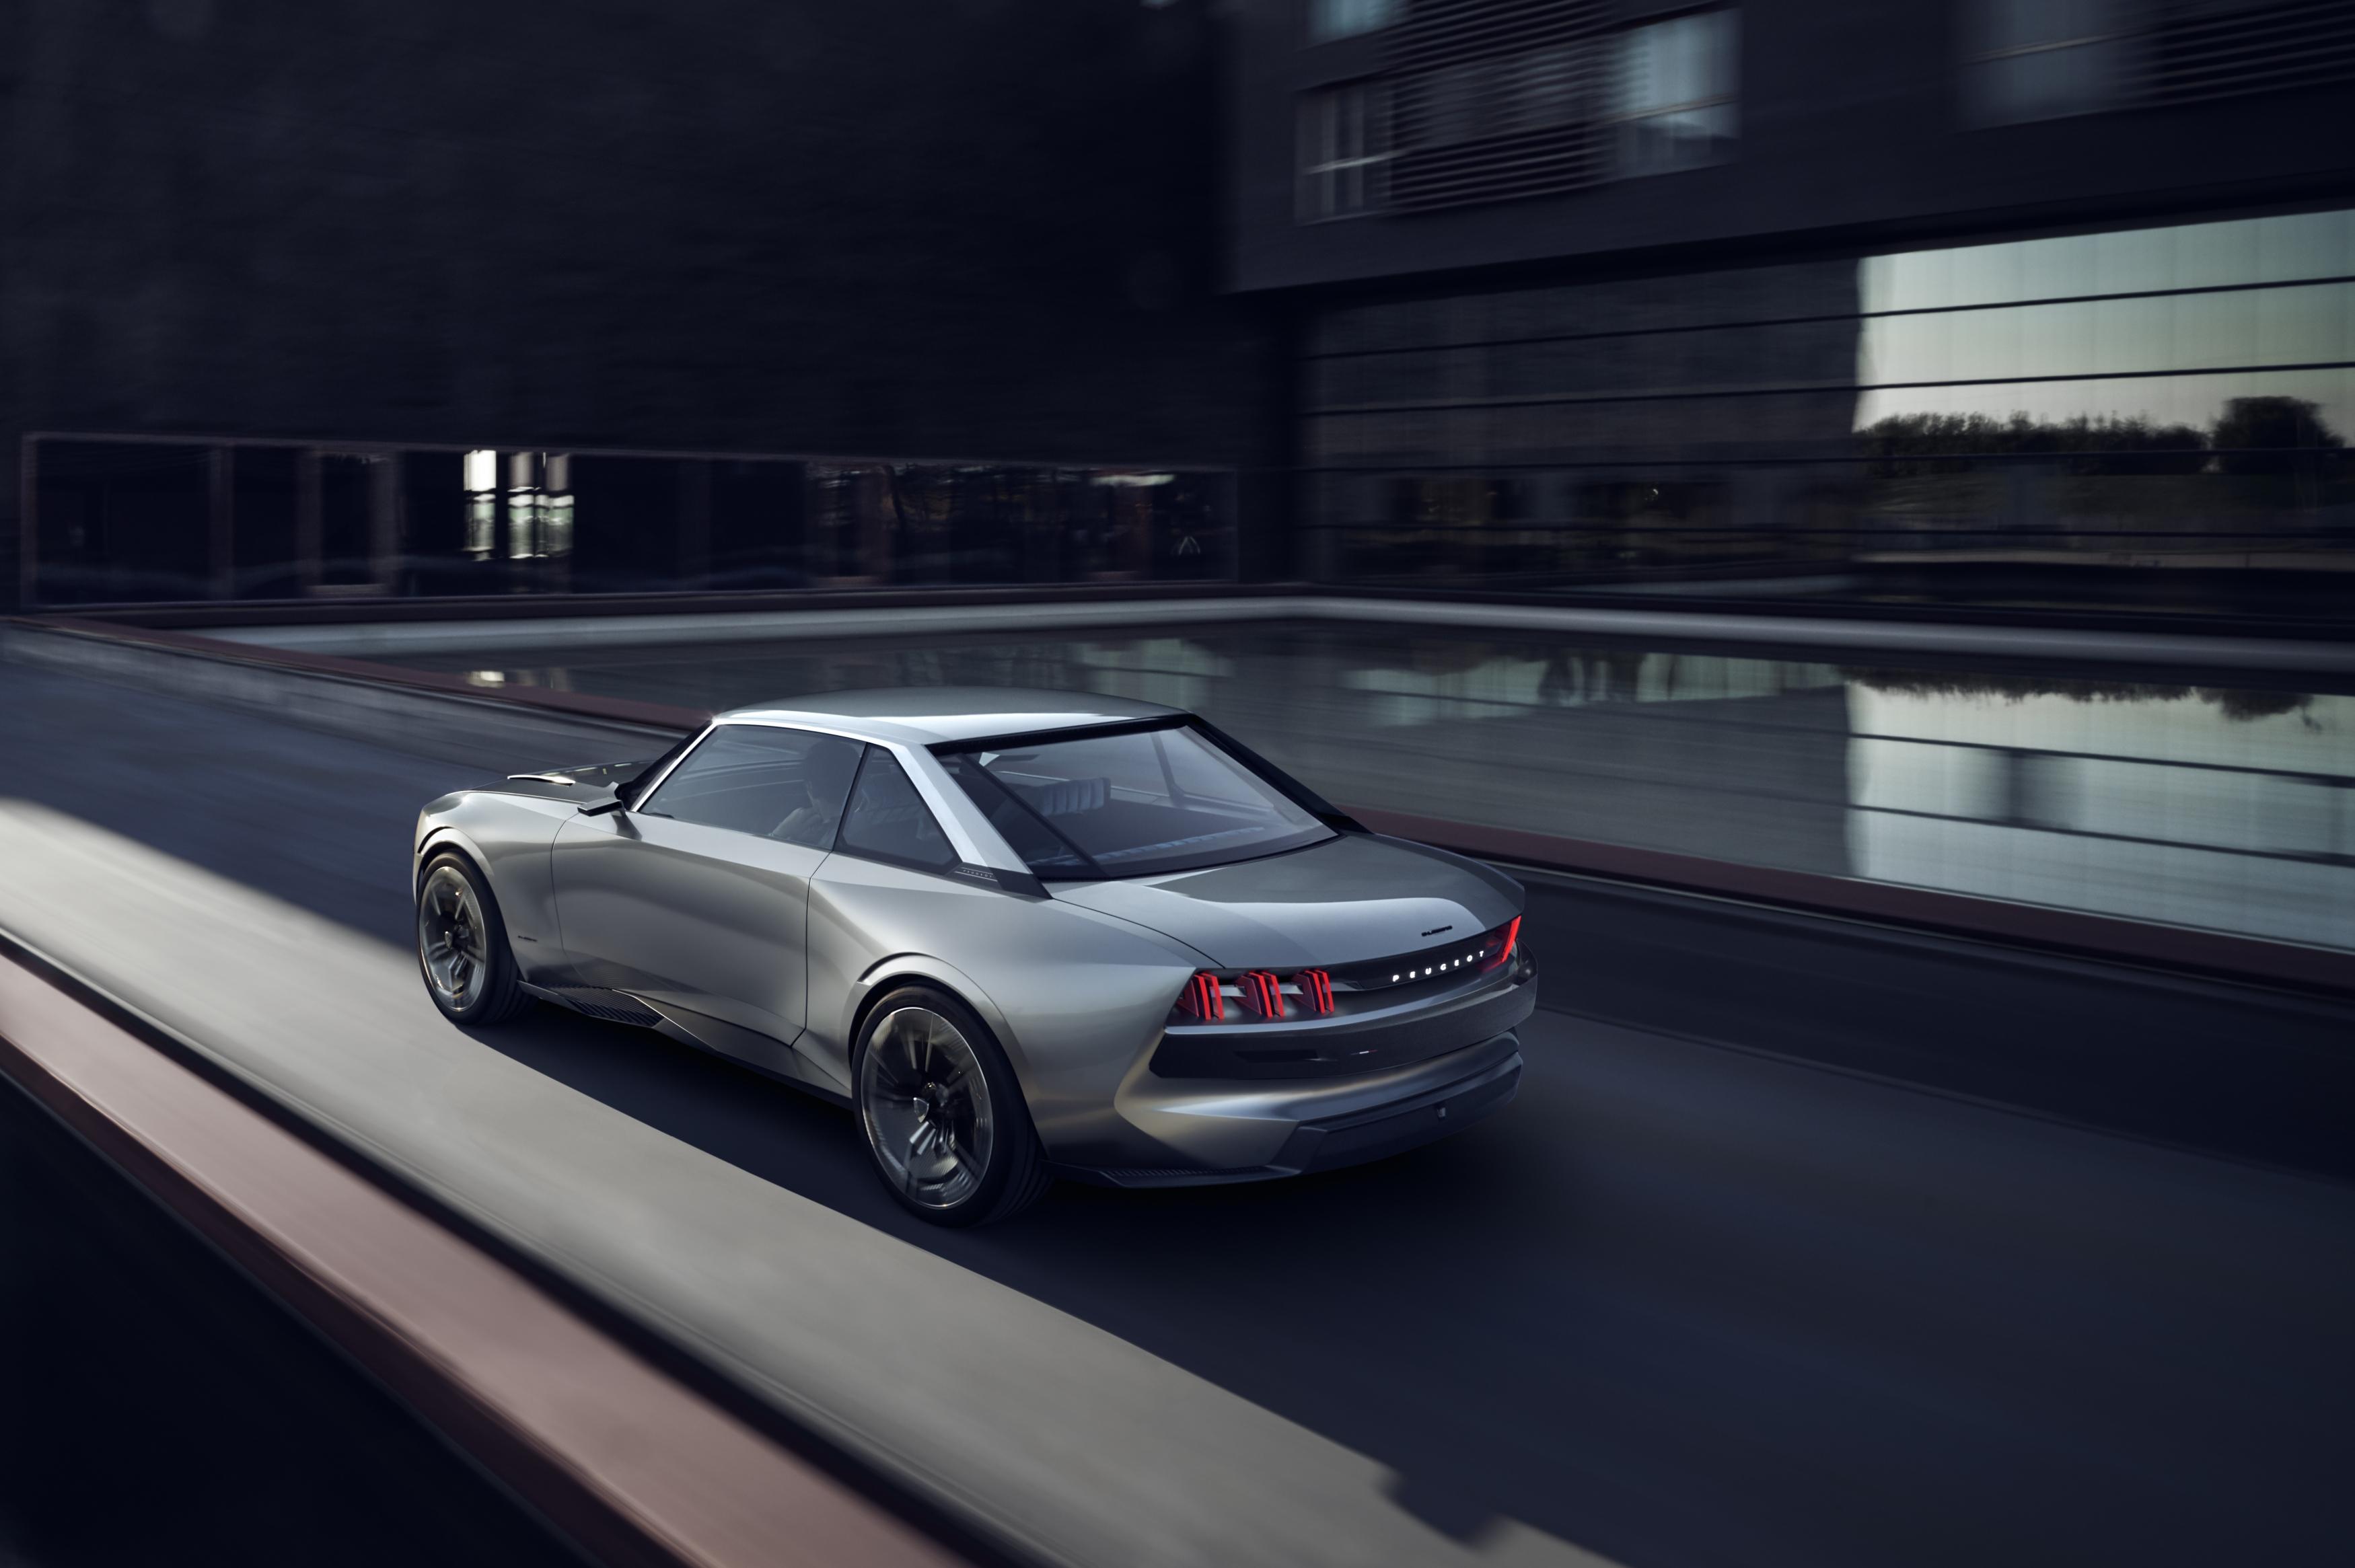 Peugeot E Legend Vs Tesla Roadster Electric Cars Of The Future Compared Inverse